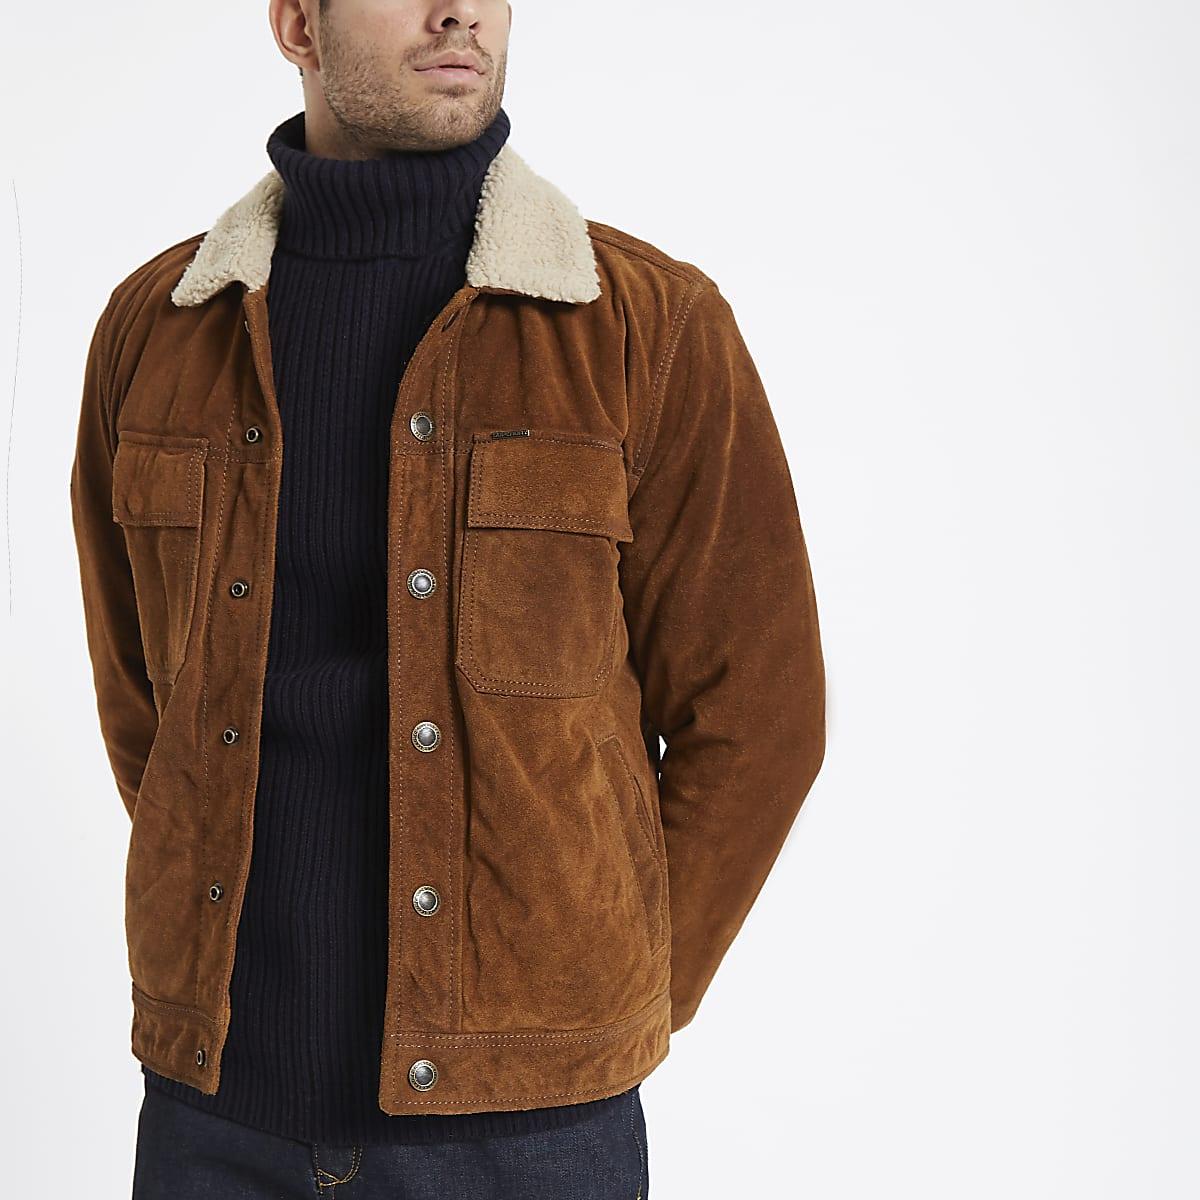 Superdry tan suede borg collar jacket